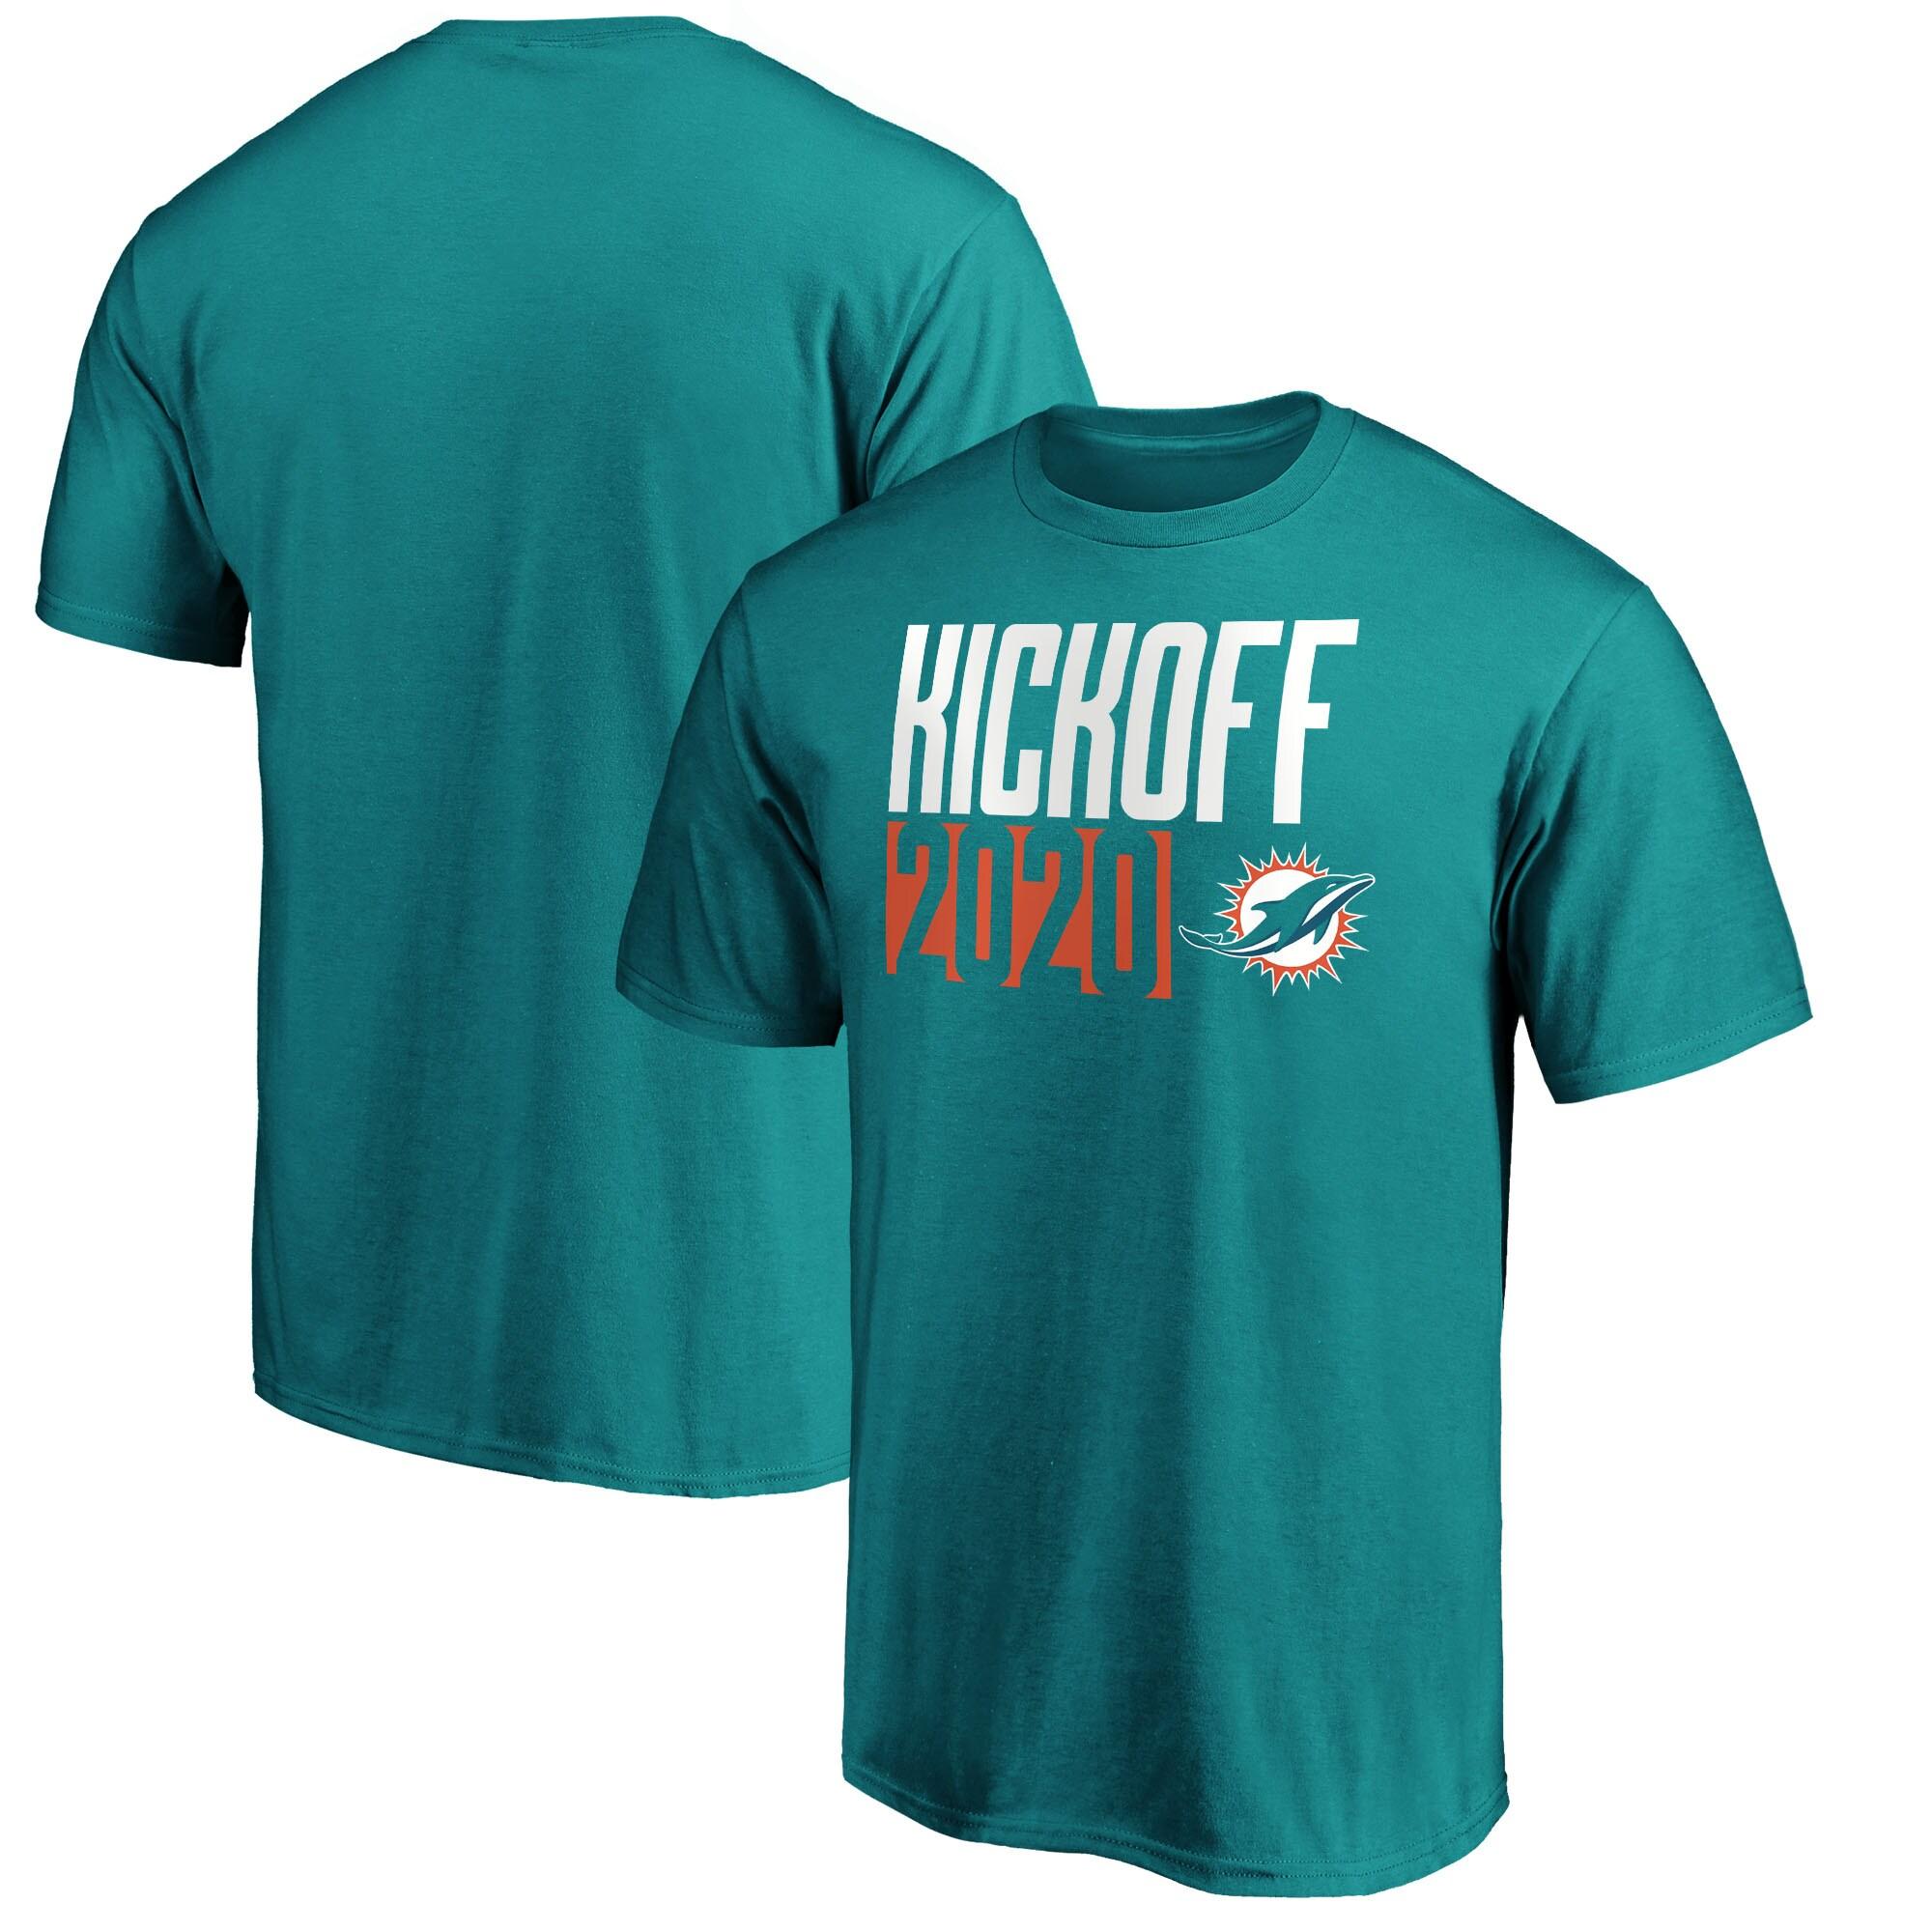 Miami Dolphins Fanatics Branded Kickoff 2020 T-Shirt - Aqua